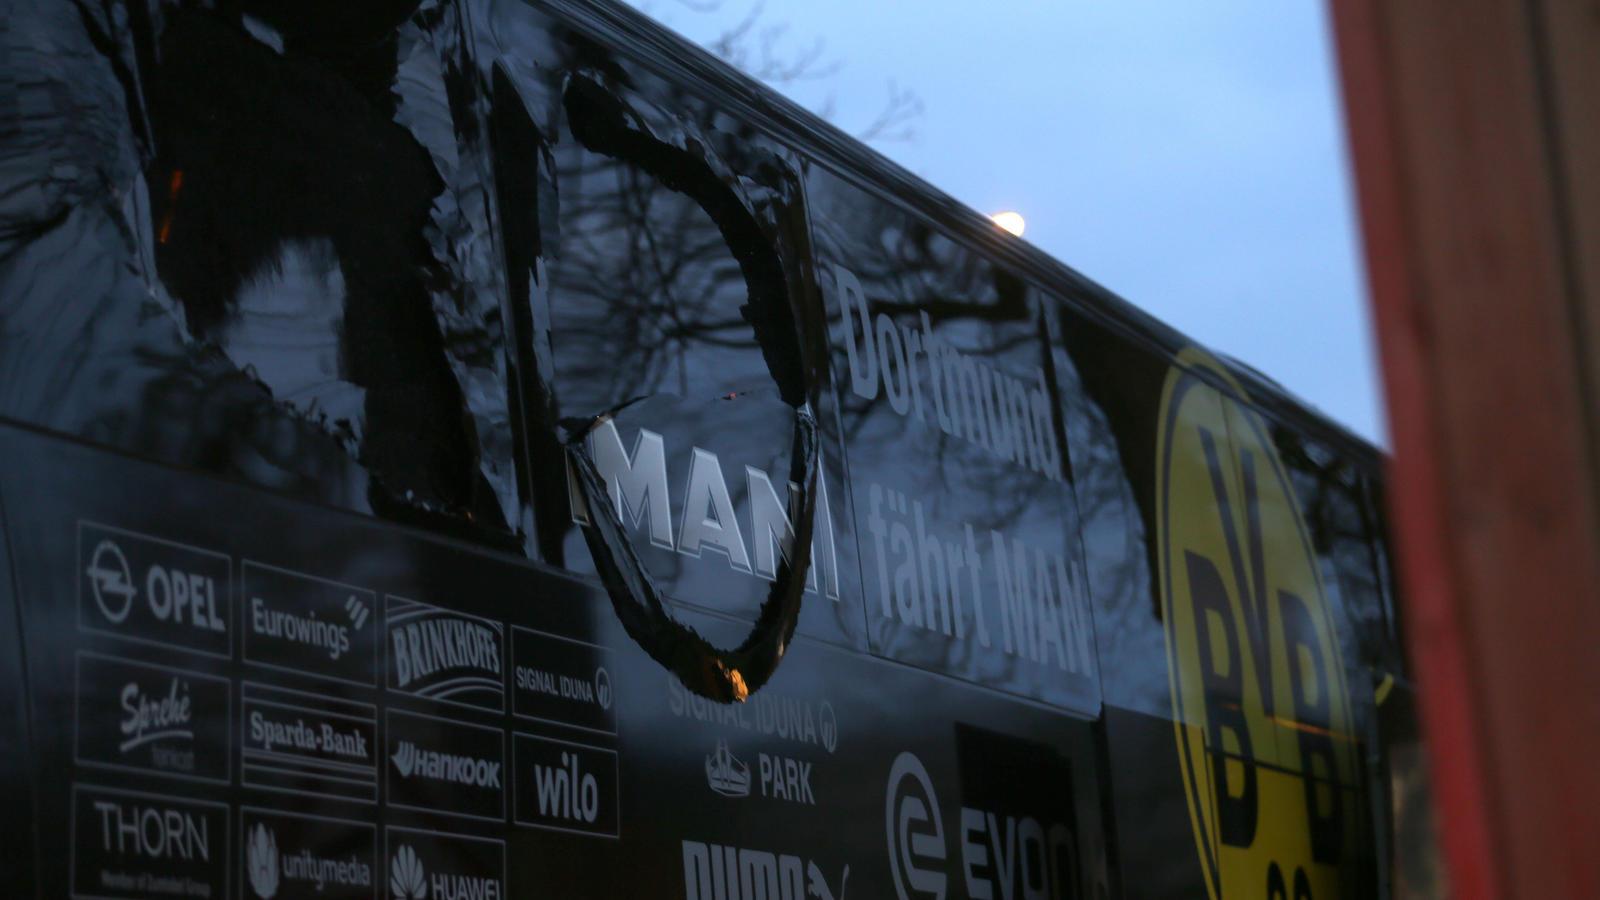 Bombenanschlag Bvb Bus